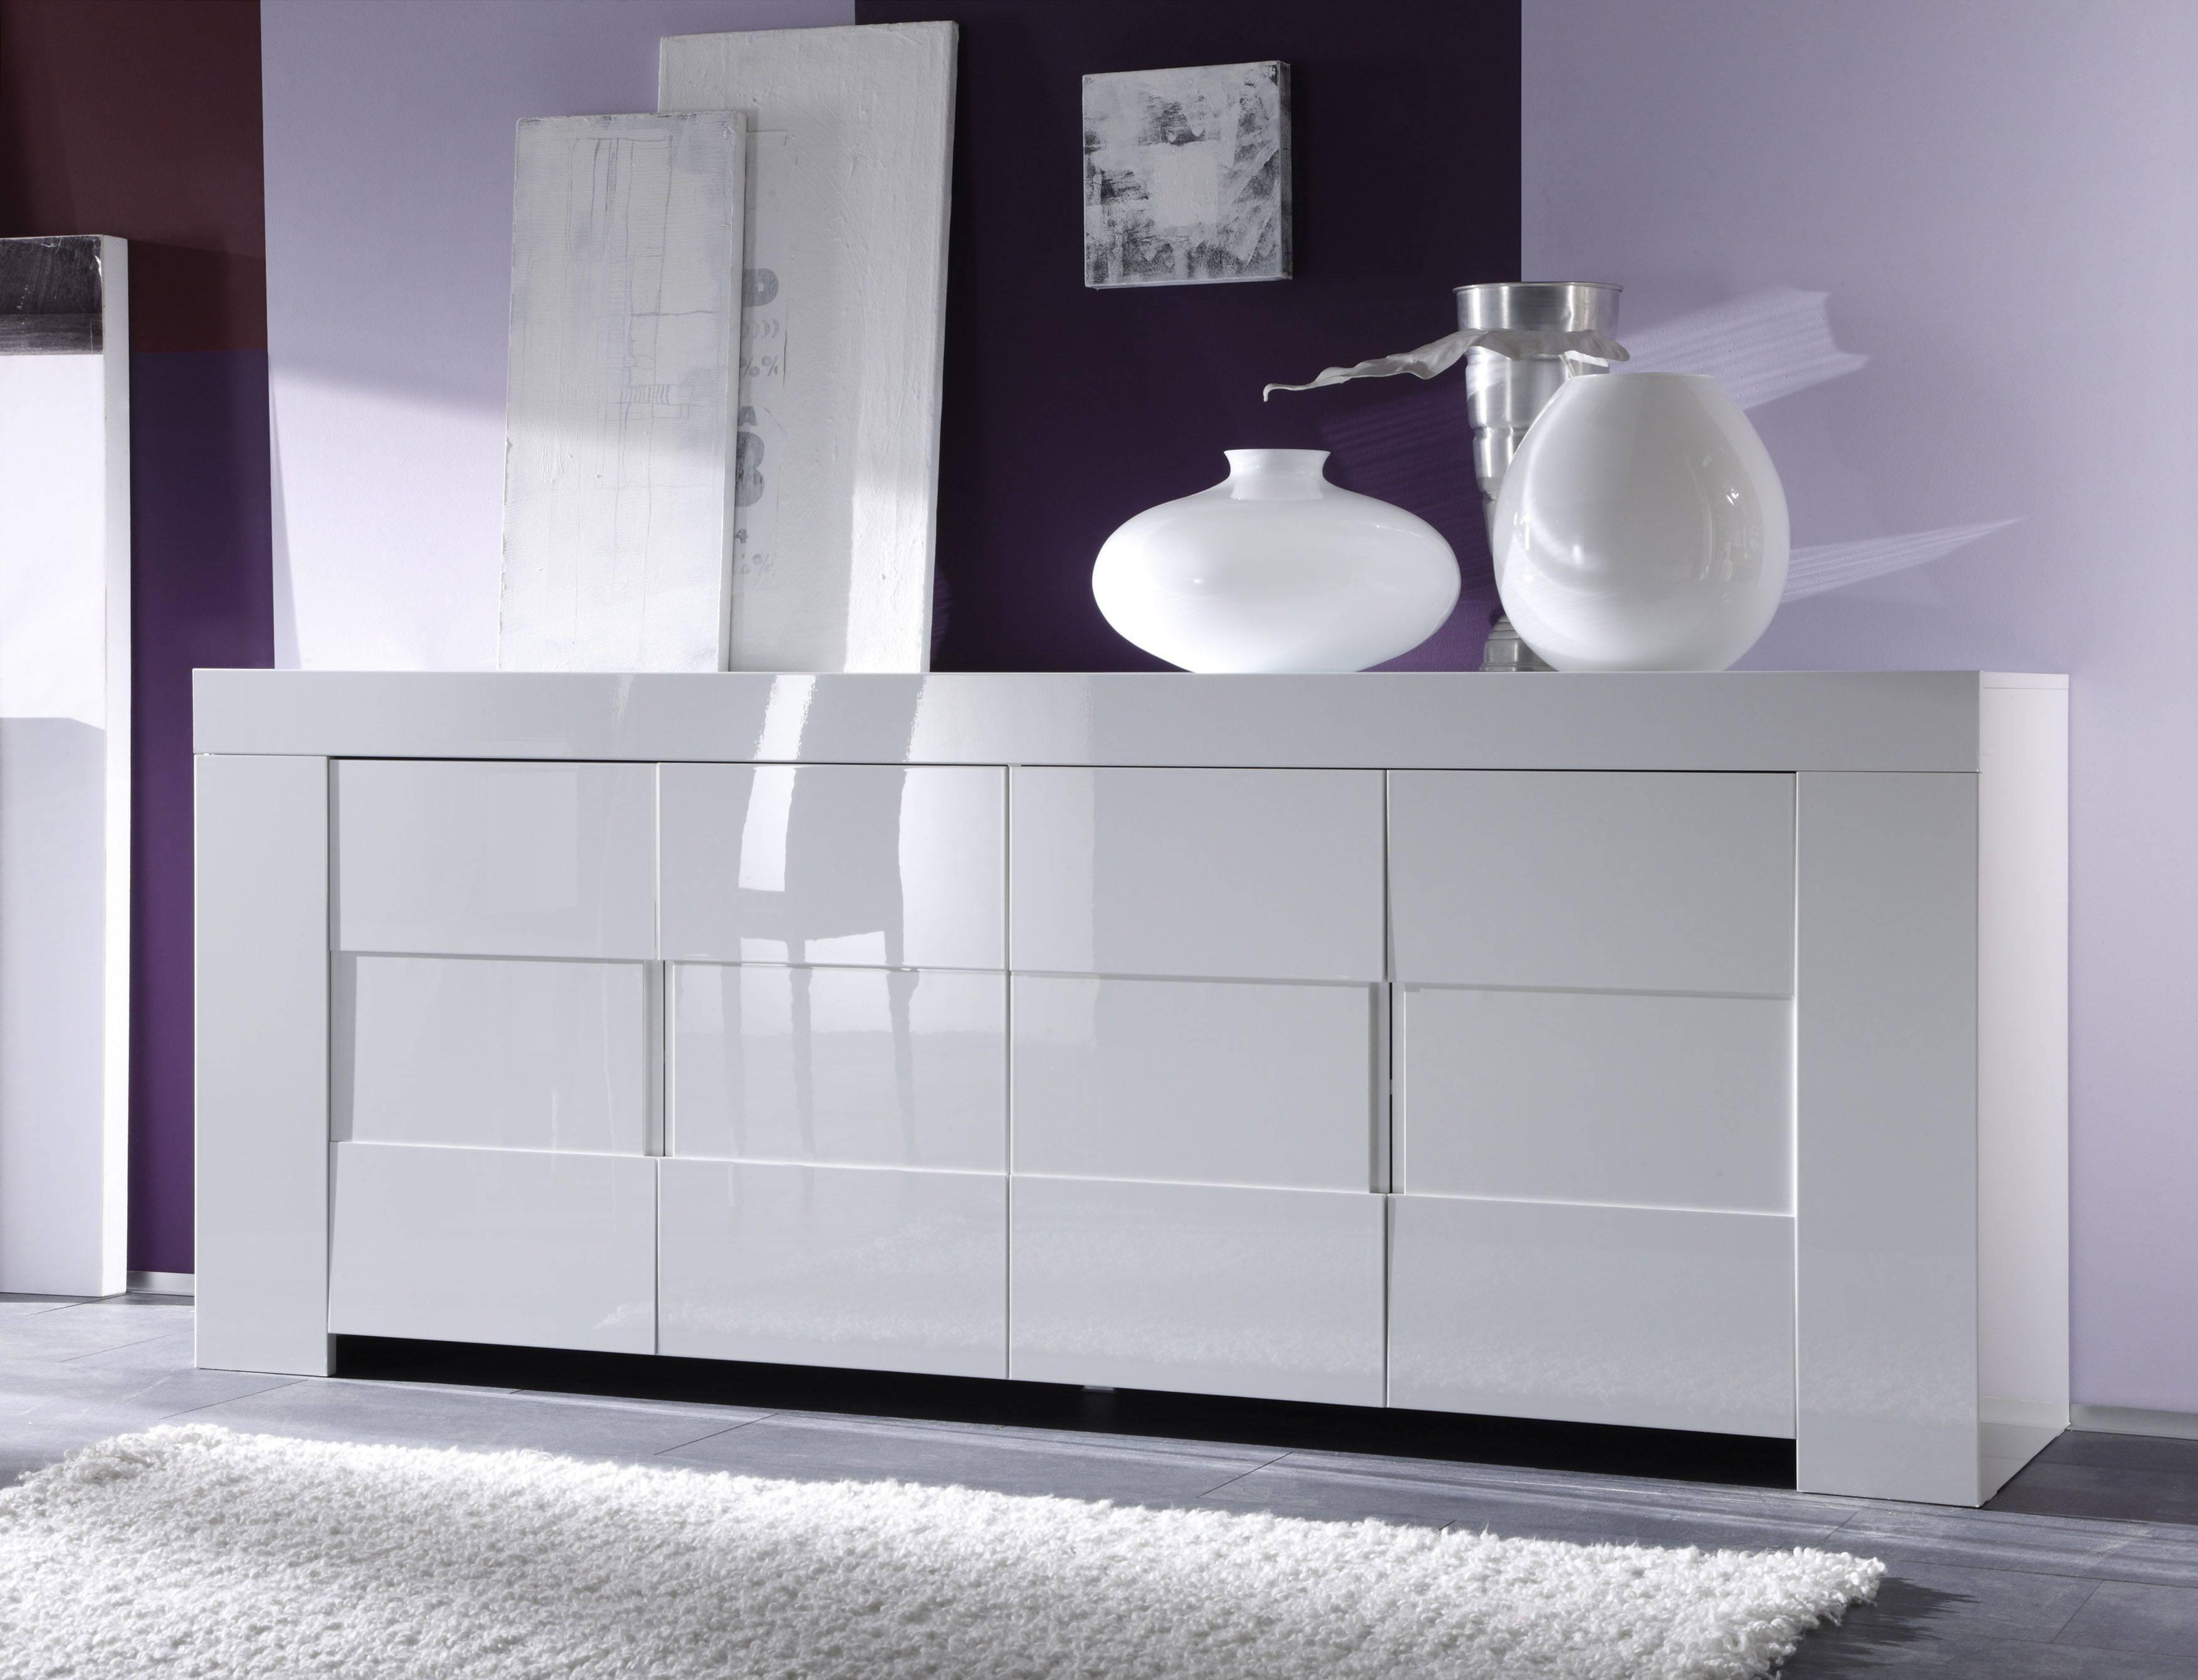 Italian Four Door High Gloss White Or Oak Veneer Buffet Sidaboard Regarding White Modern Sideboard (View 8 of 20)